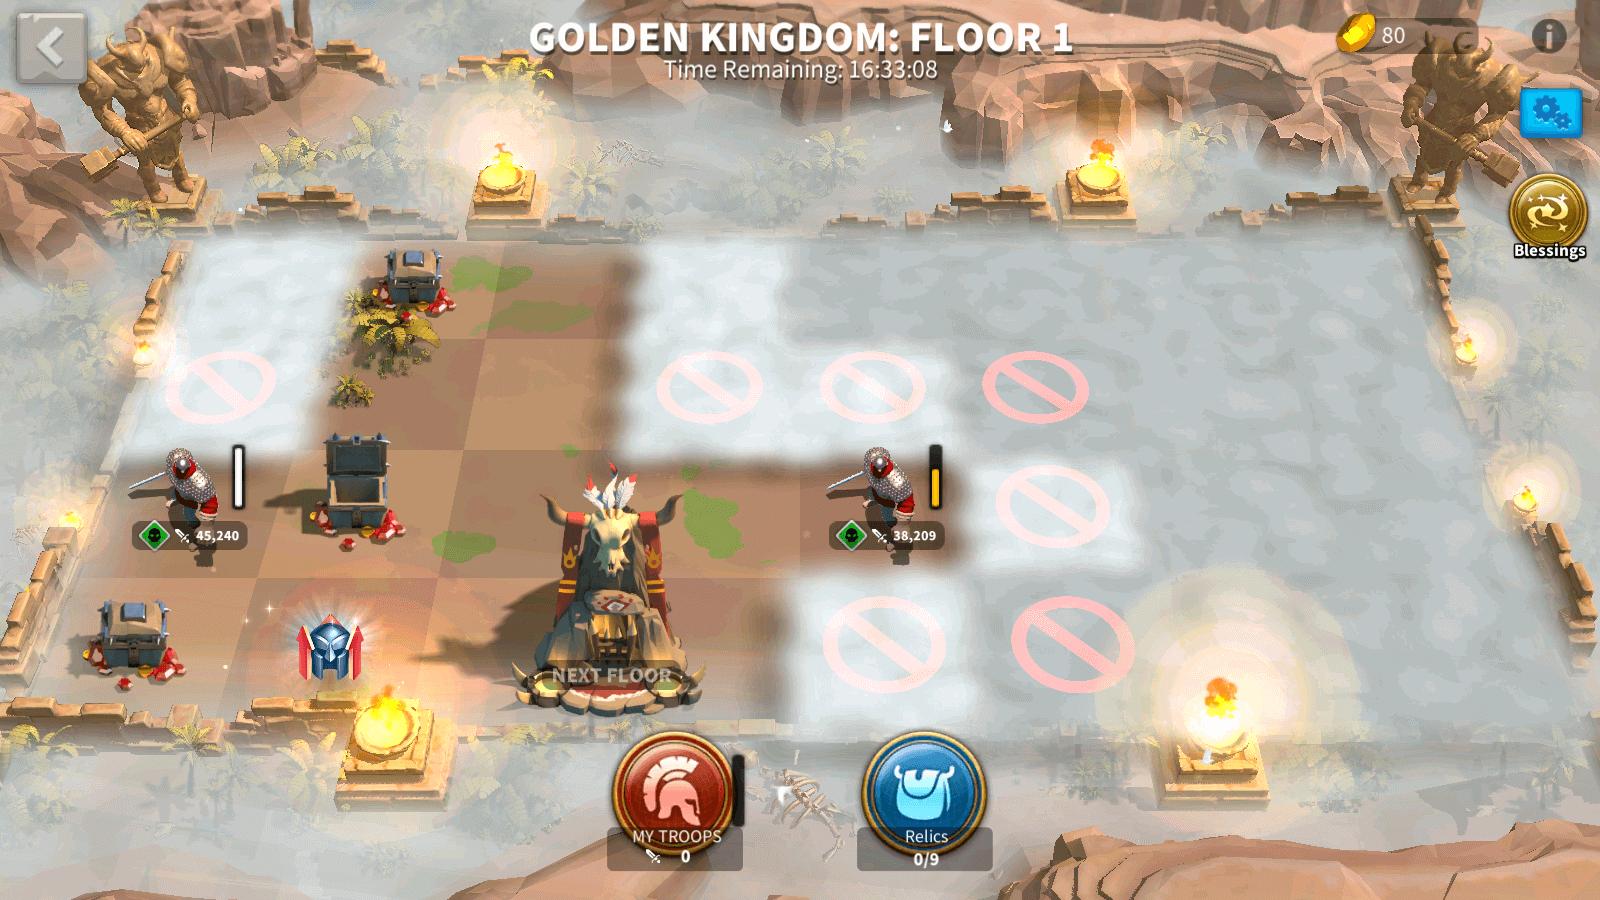 The Golden Kingdom Event 2